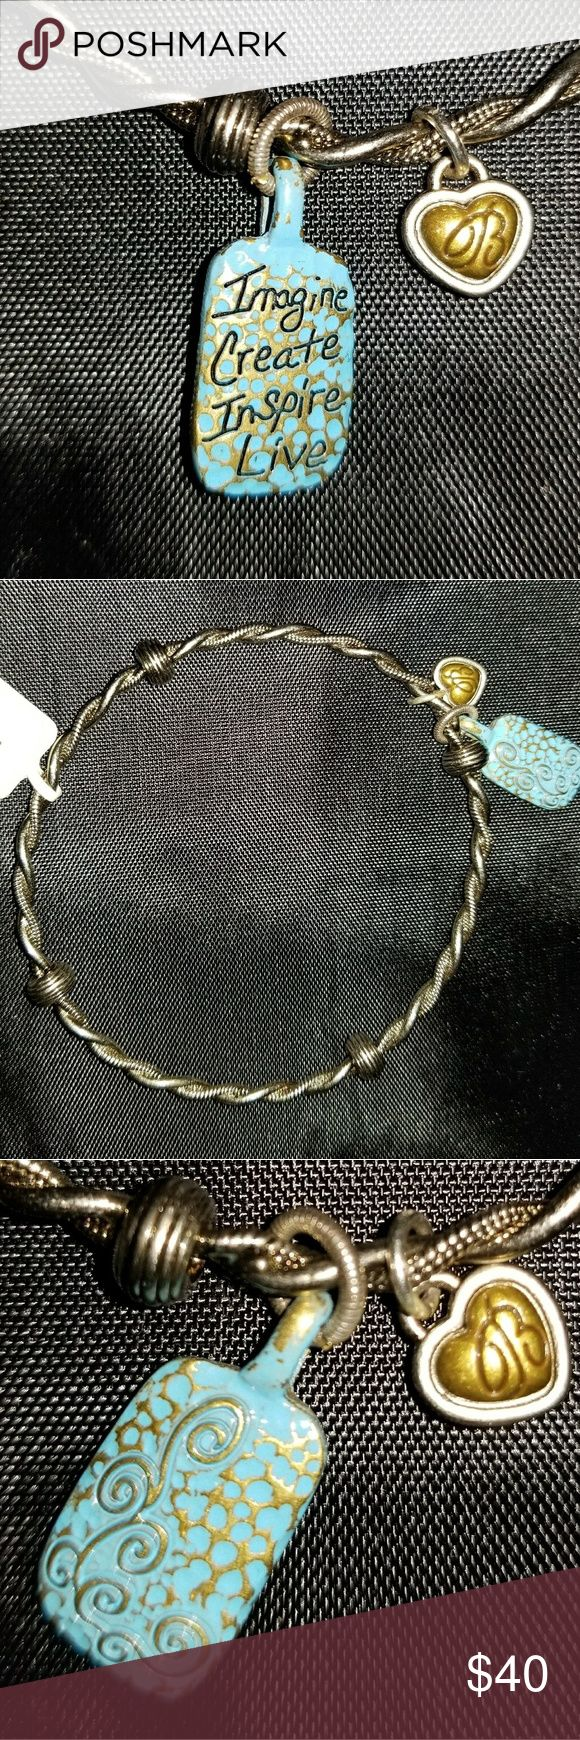 🔖NWT BRIGHTON ART & SOUL Brighton Silver Art & Soul Charm BRACELET. Brand New with tag. Brighton Jewelry Bracelets